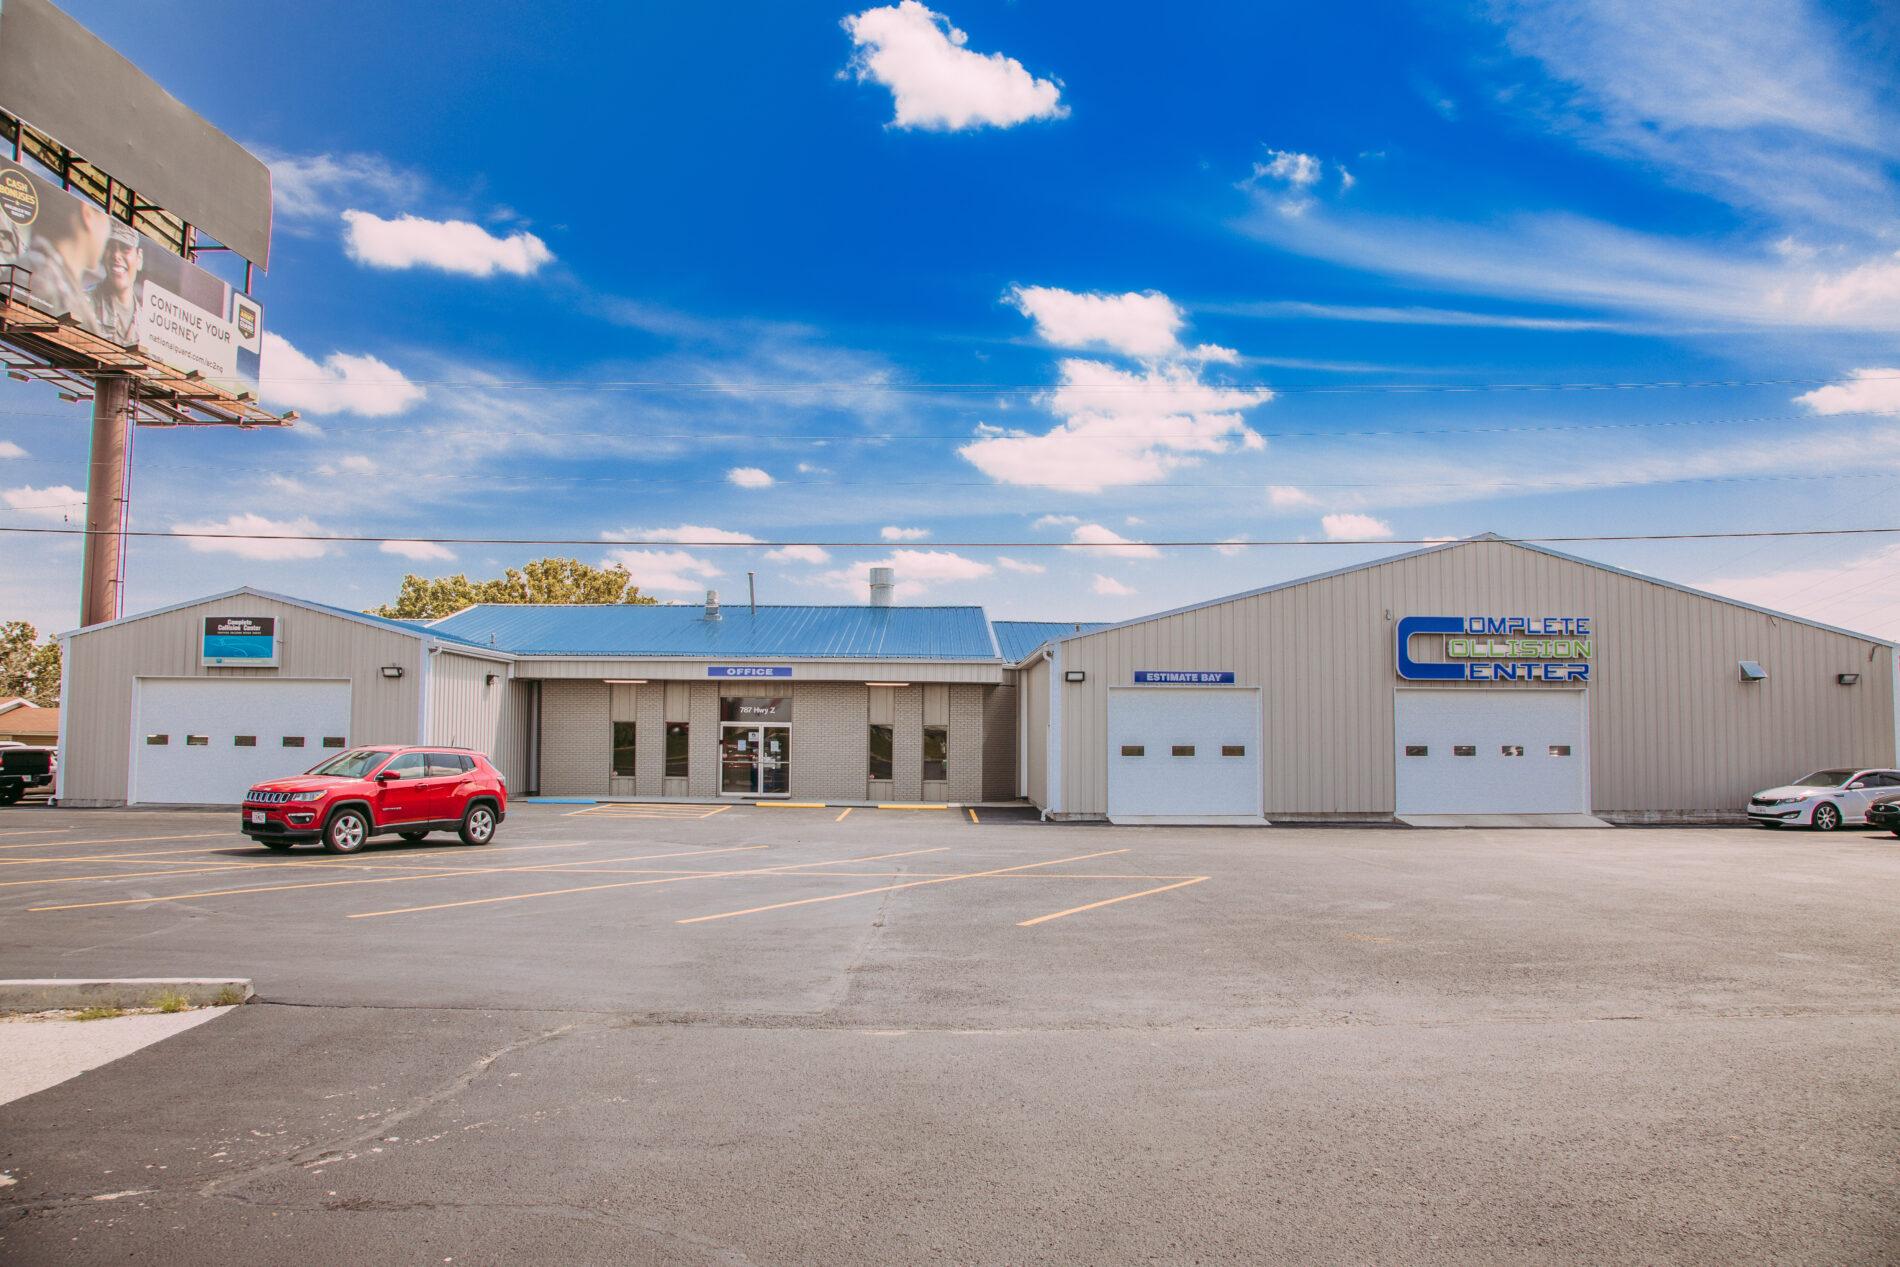 Complete Collision Center location in St. Robert, Missouri